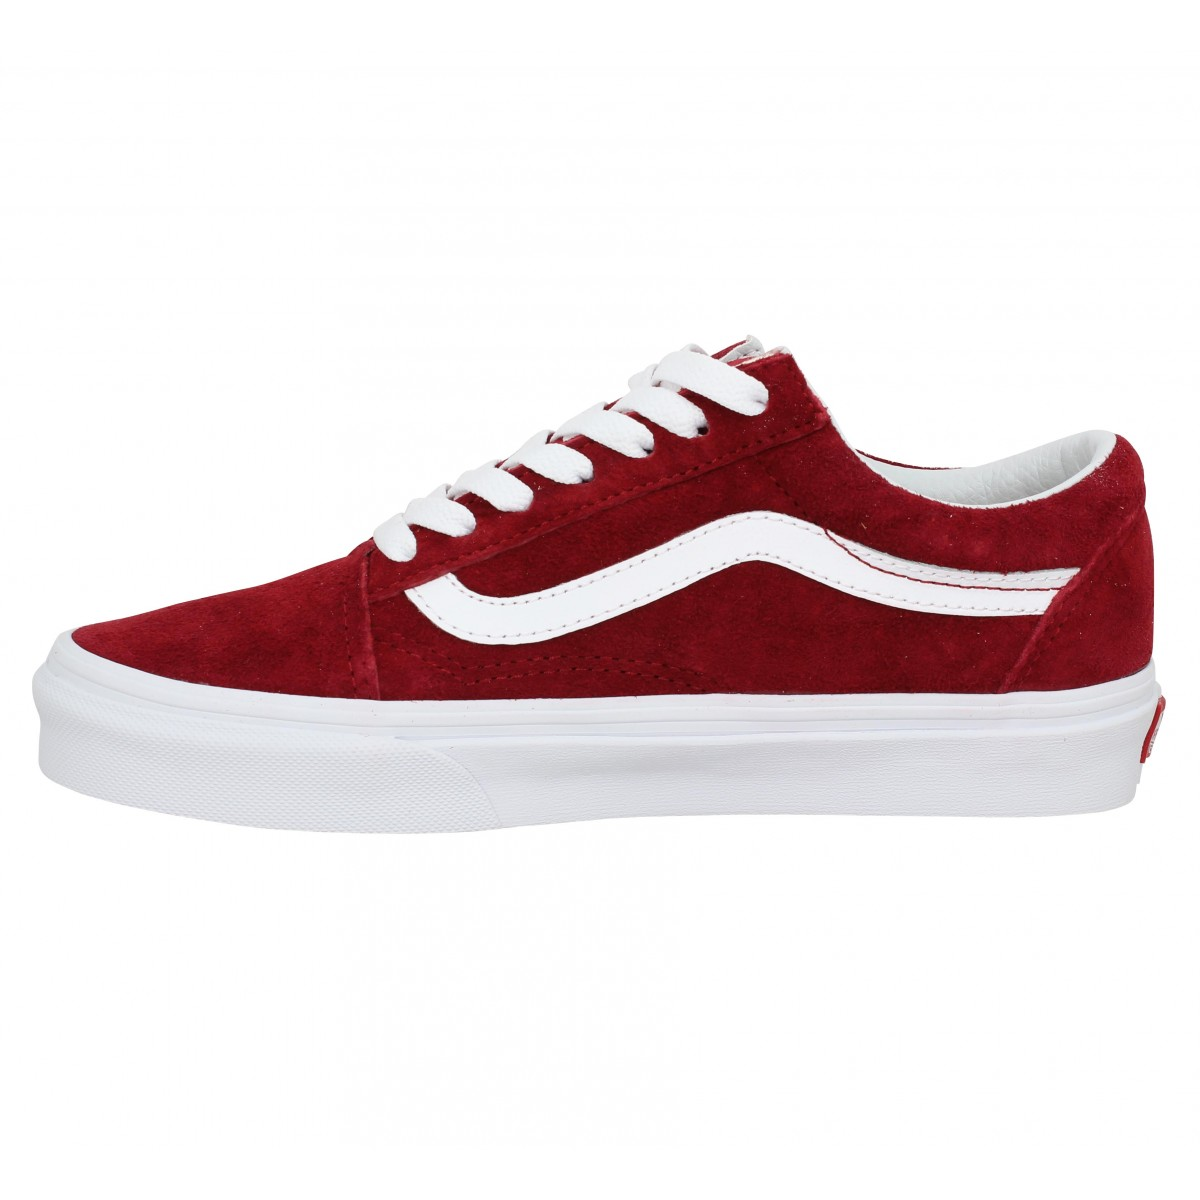 Vans old skool velours femme rouge femme | Fanny chaussures